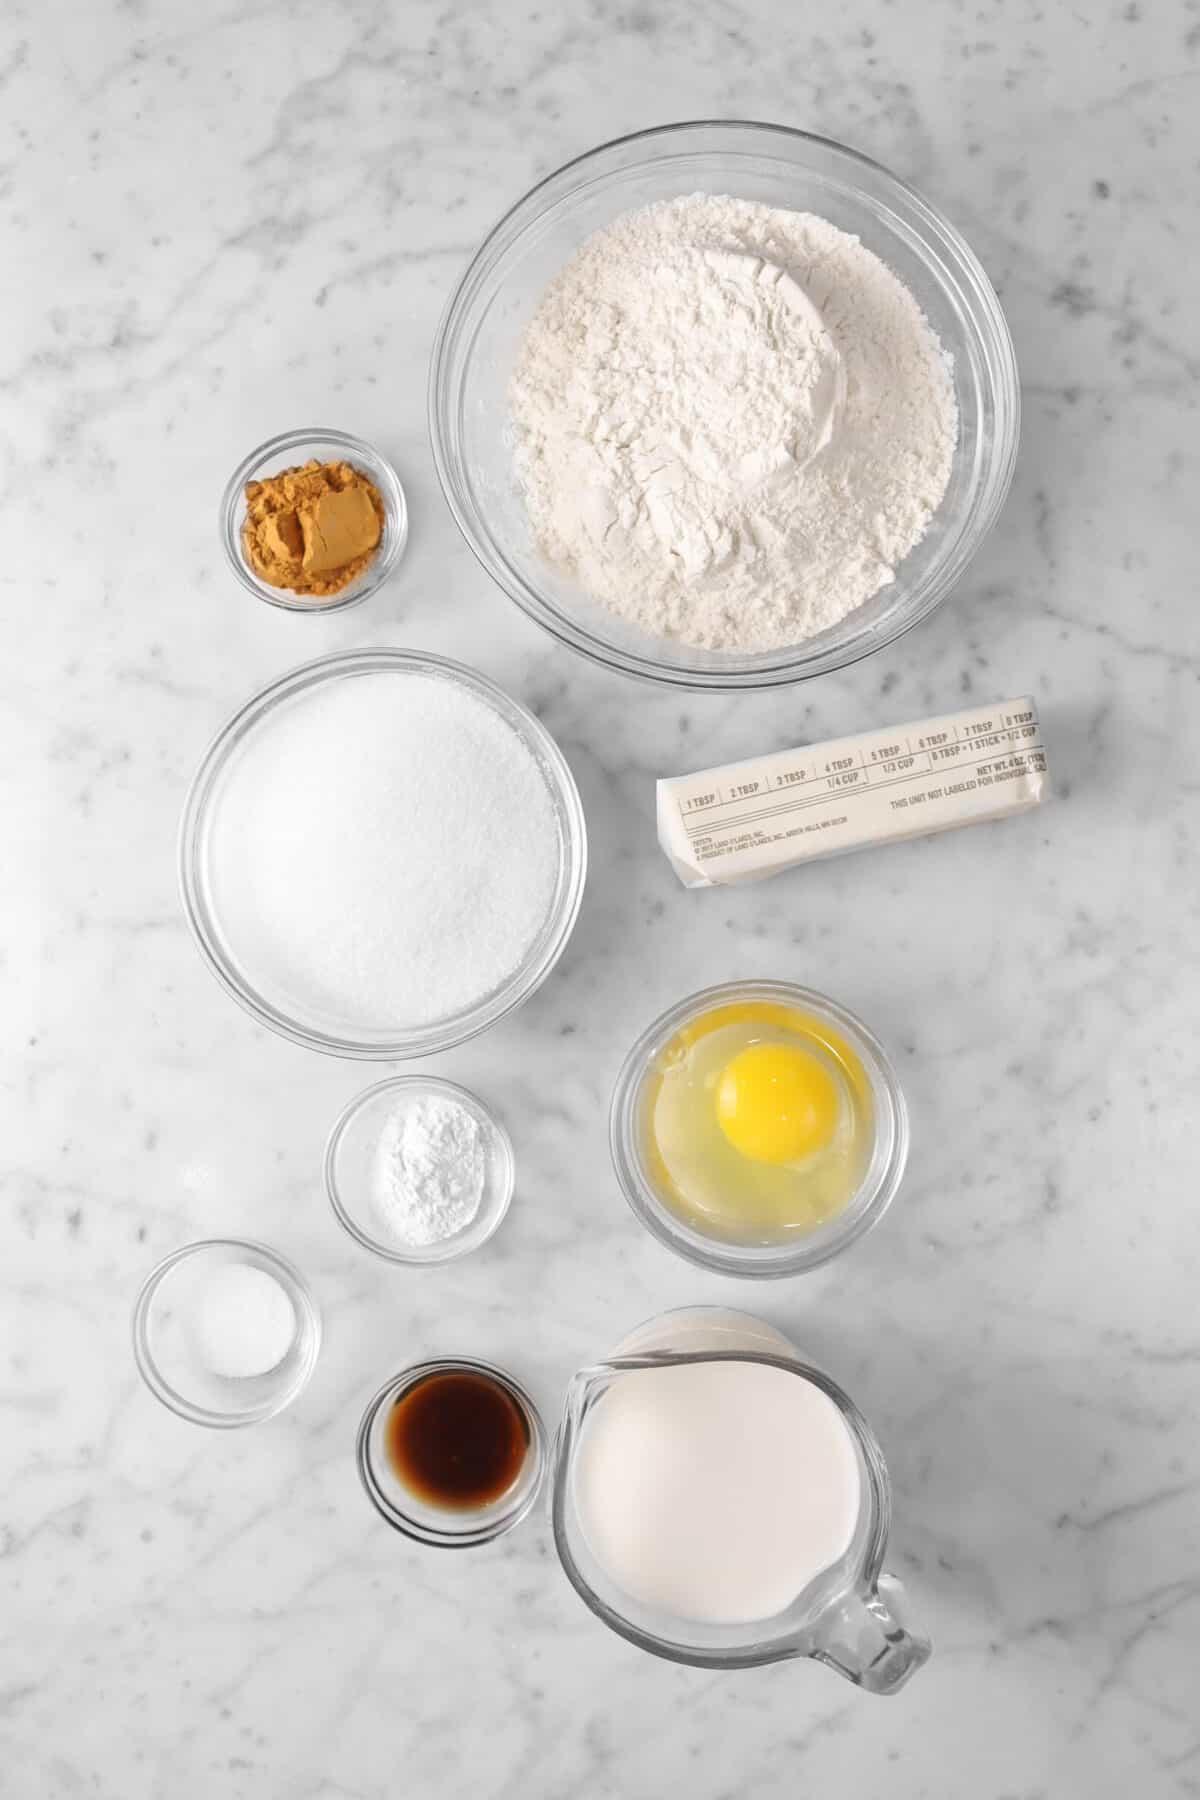 flour, cinnamon, sugar, salt, egg, baking powder, salt, vanilla, milk on marble counter